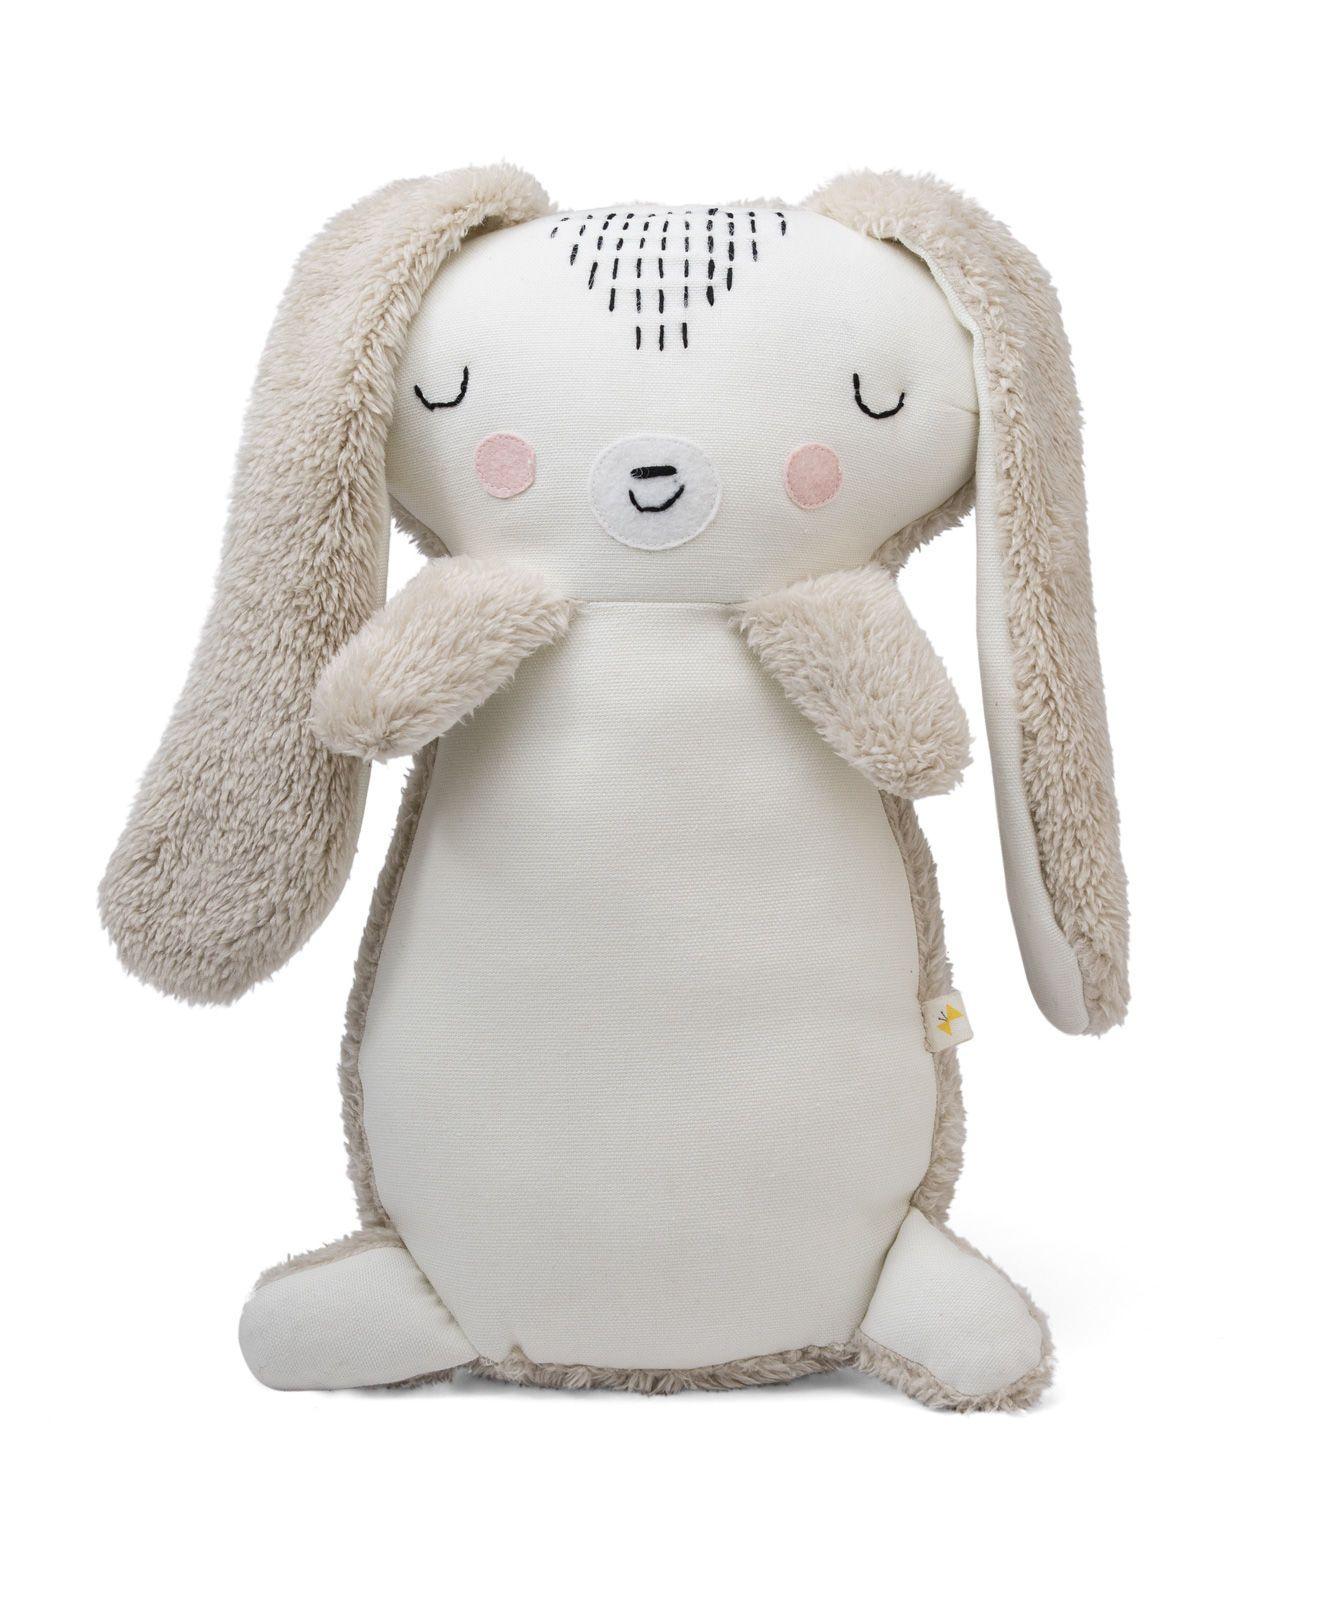 Hello Kitty Bureaustoel.Bed Time Bunny Plush Wish Home Bunny Plush Plush